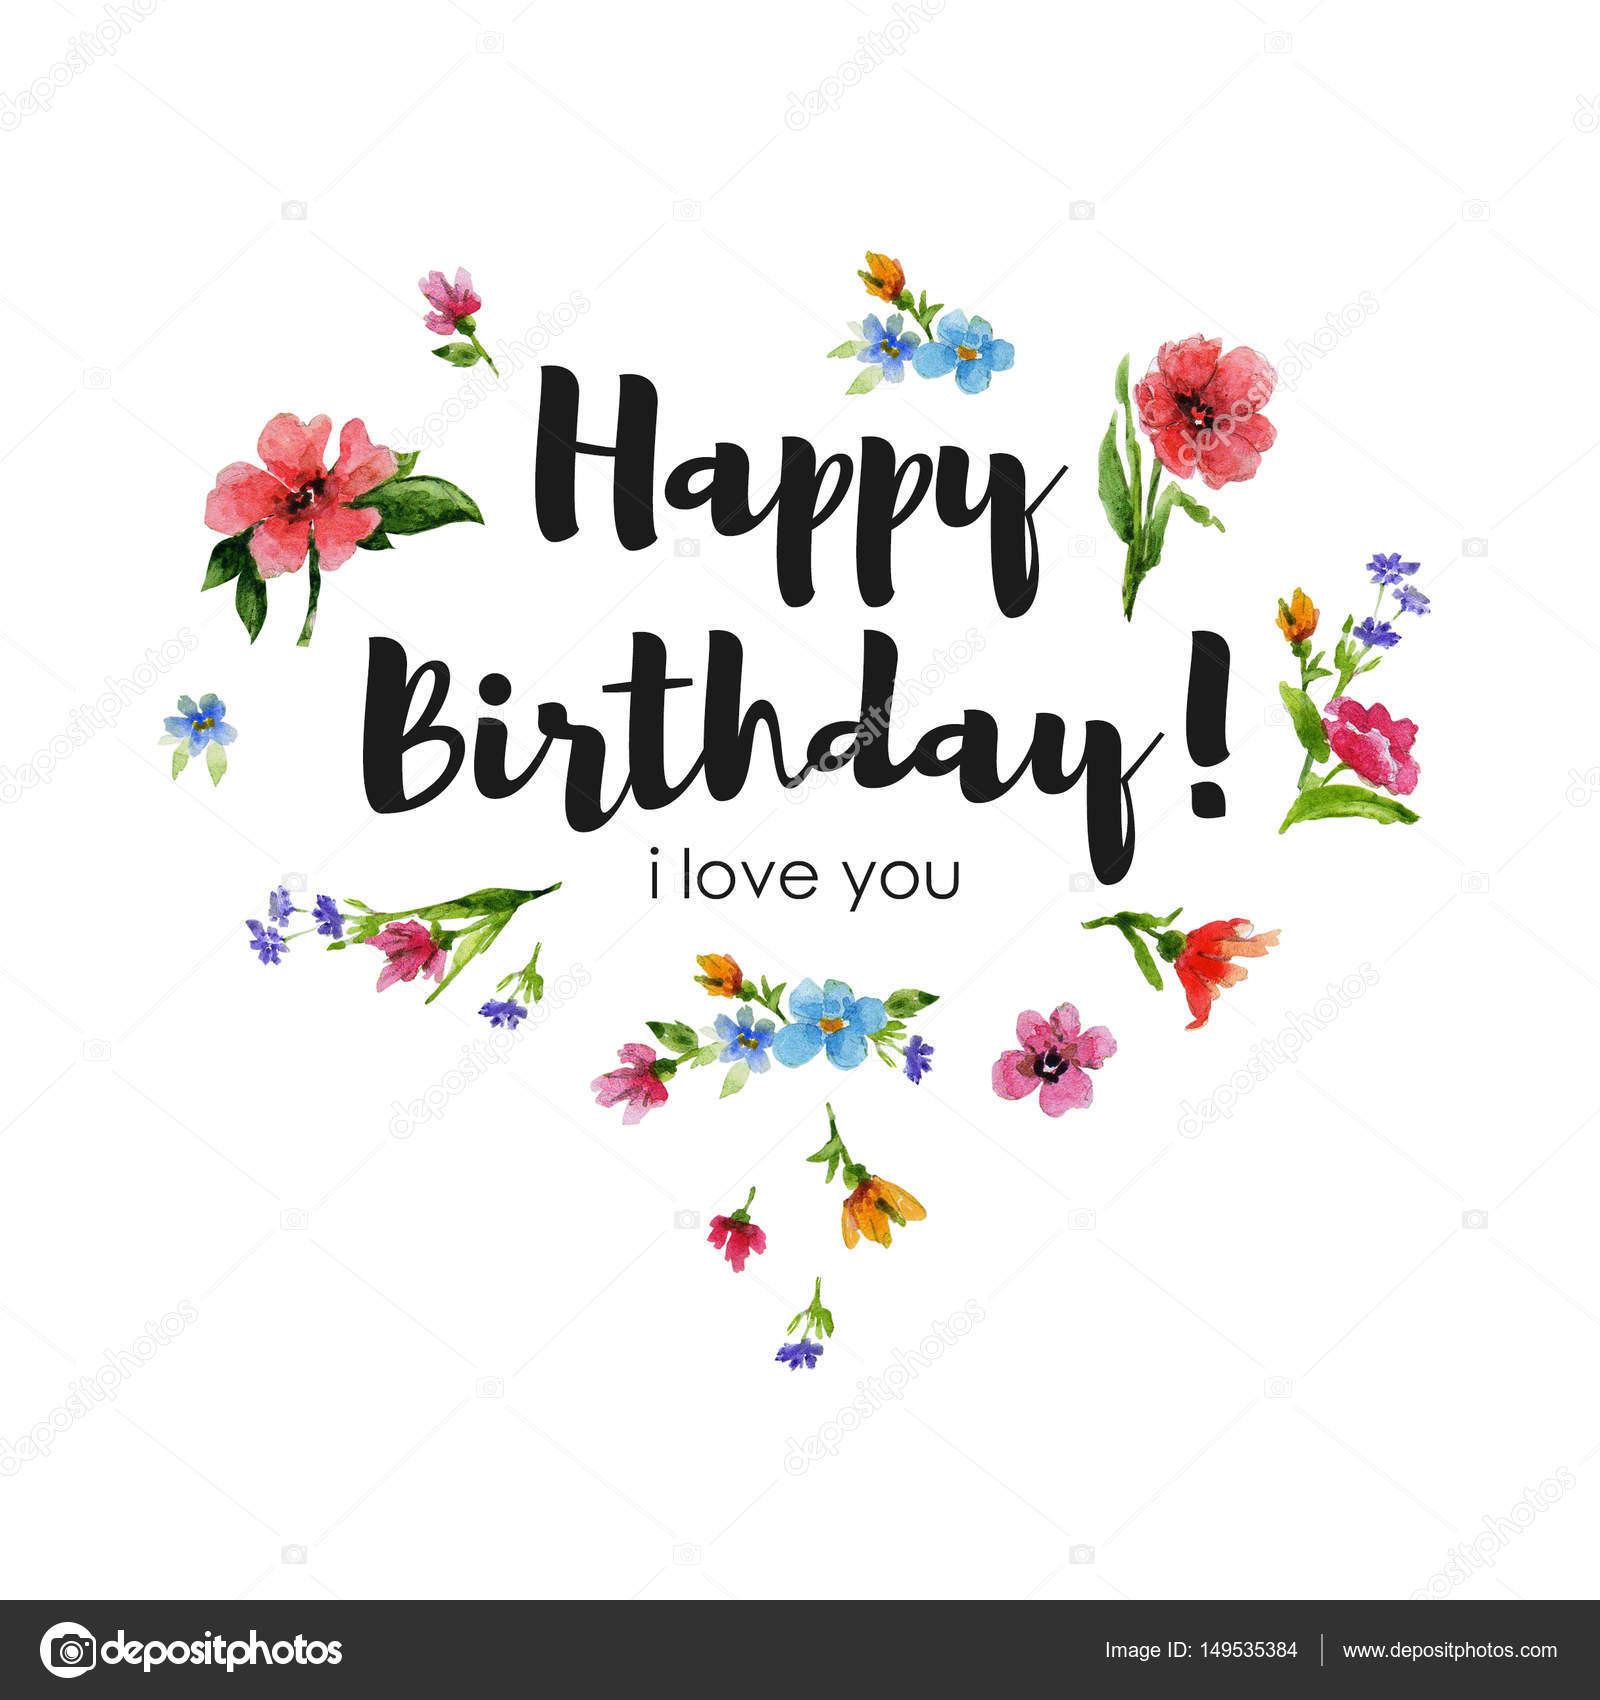 Greeting card happy birthday i love you watercolor illustration greeting card happy birthday i love you watercolor illustration with lettering and heart of wildflowers kristyandbryce Gallery